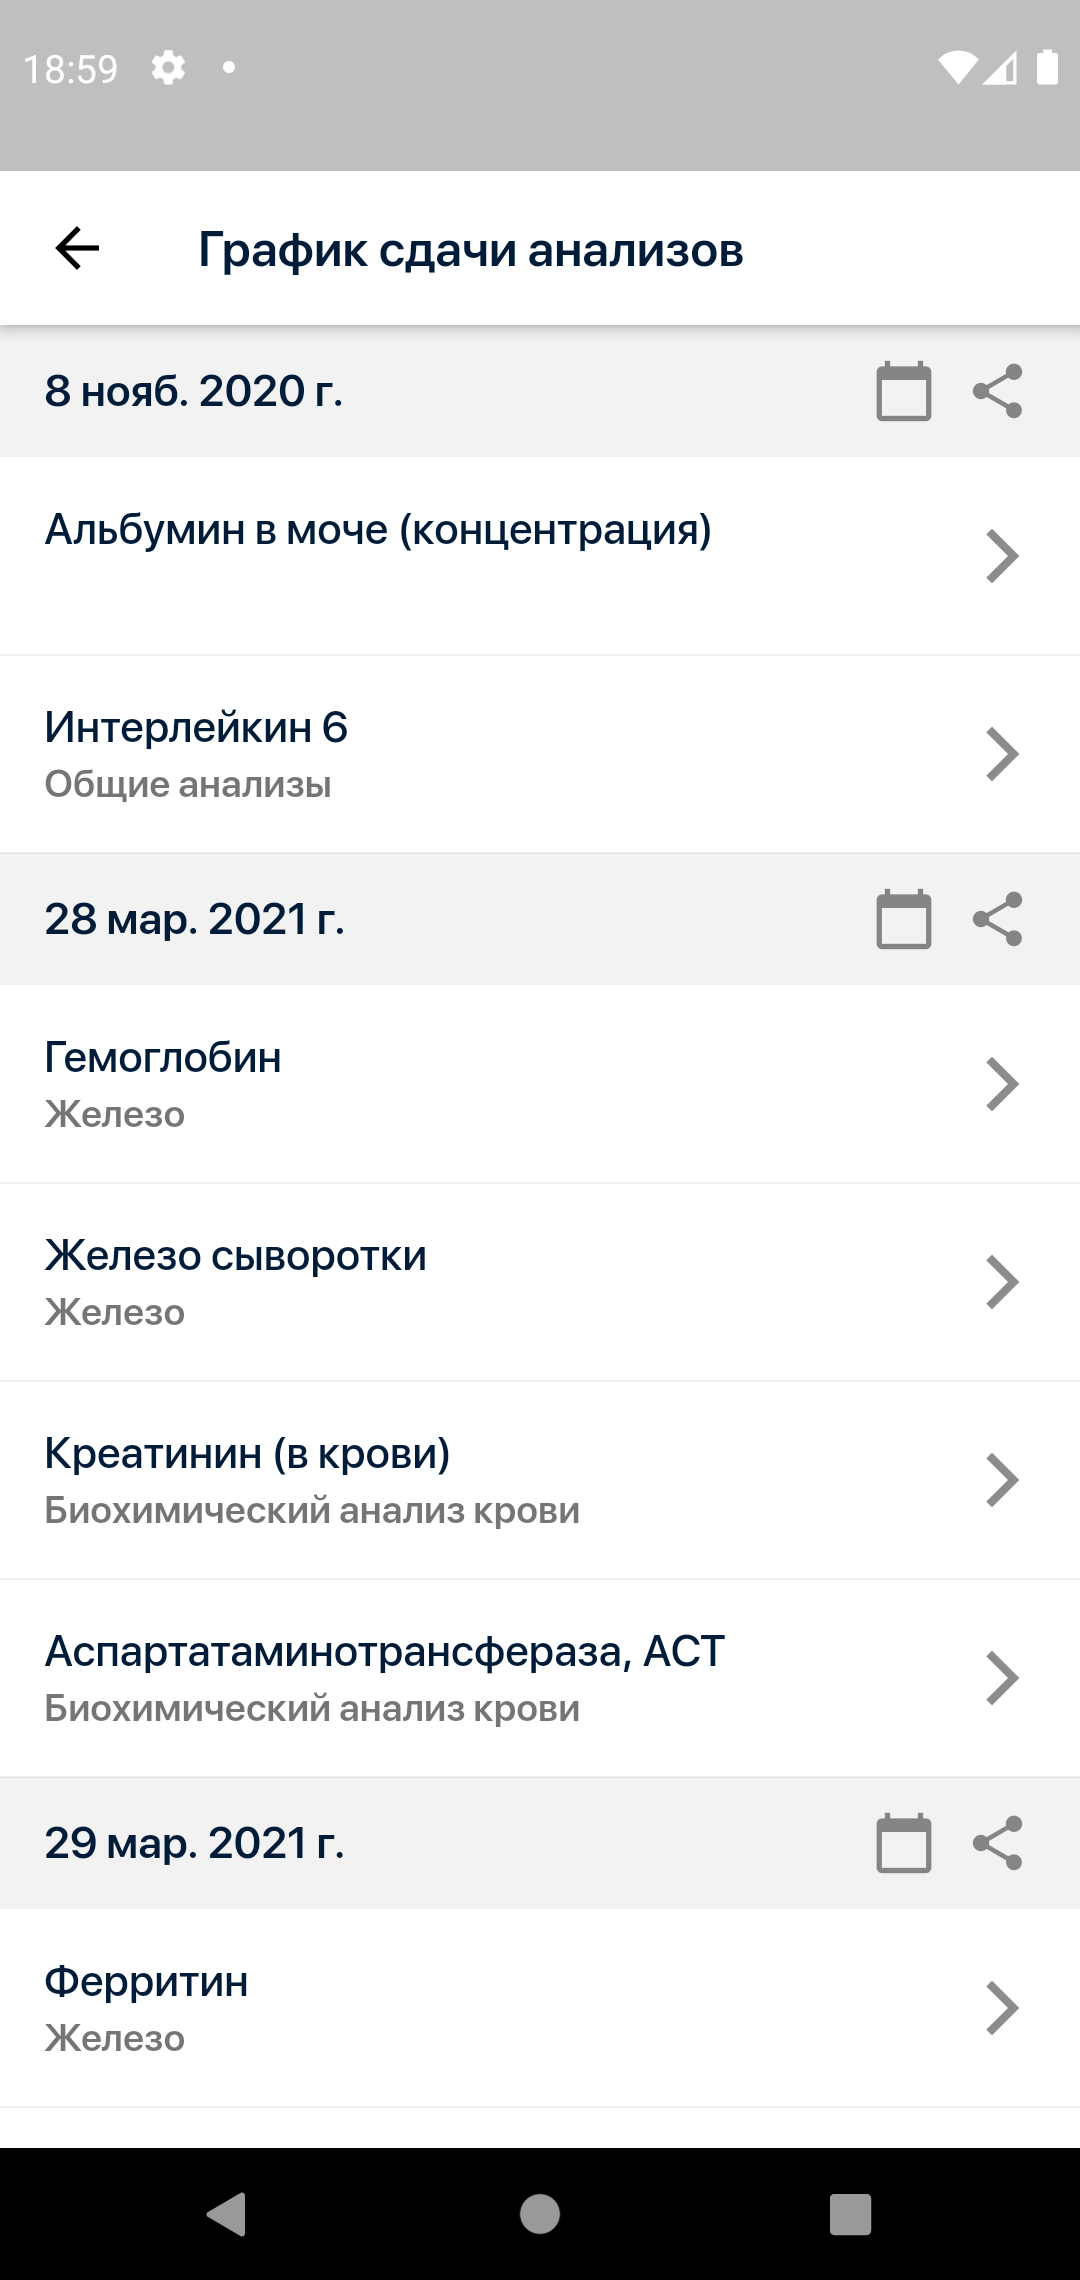 Screenshot 1604750358